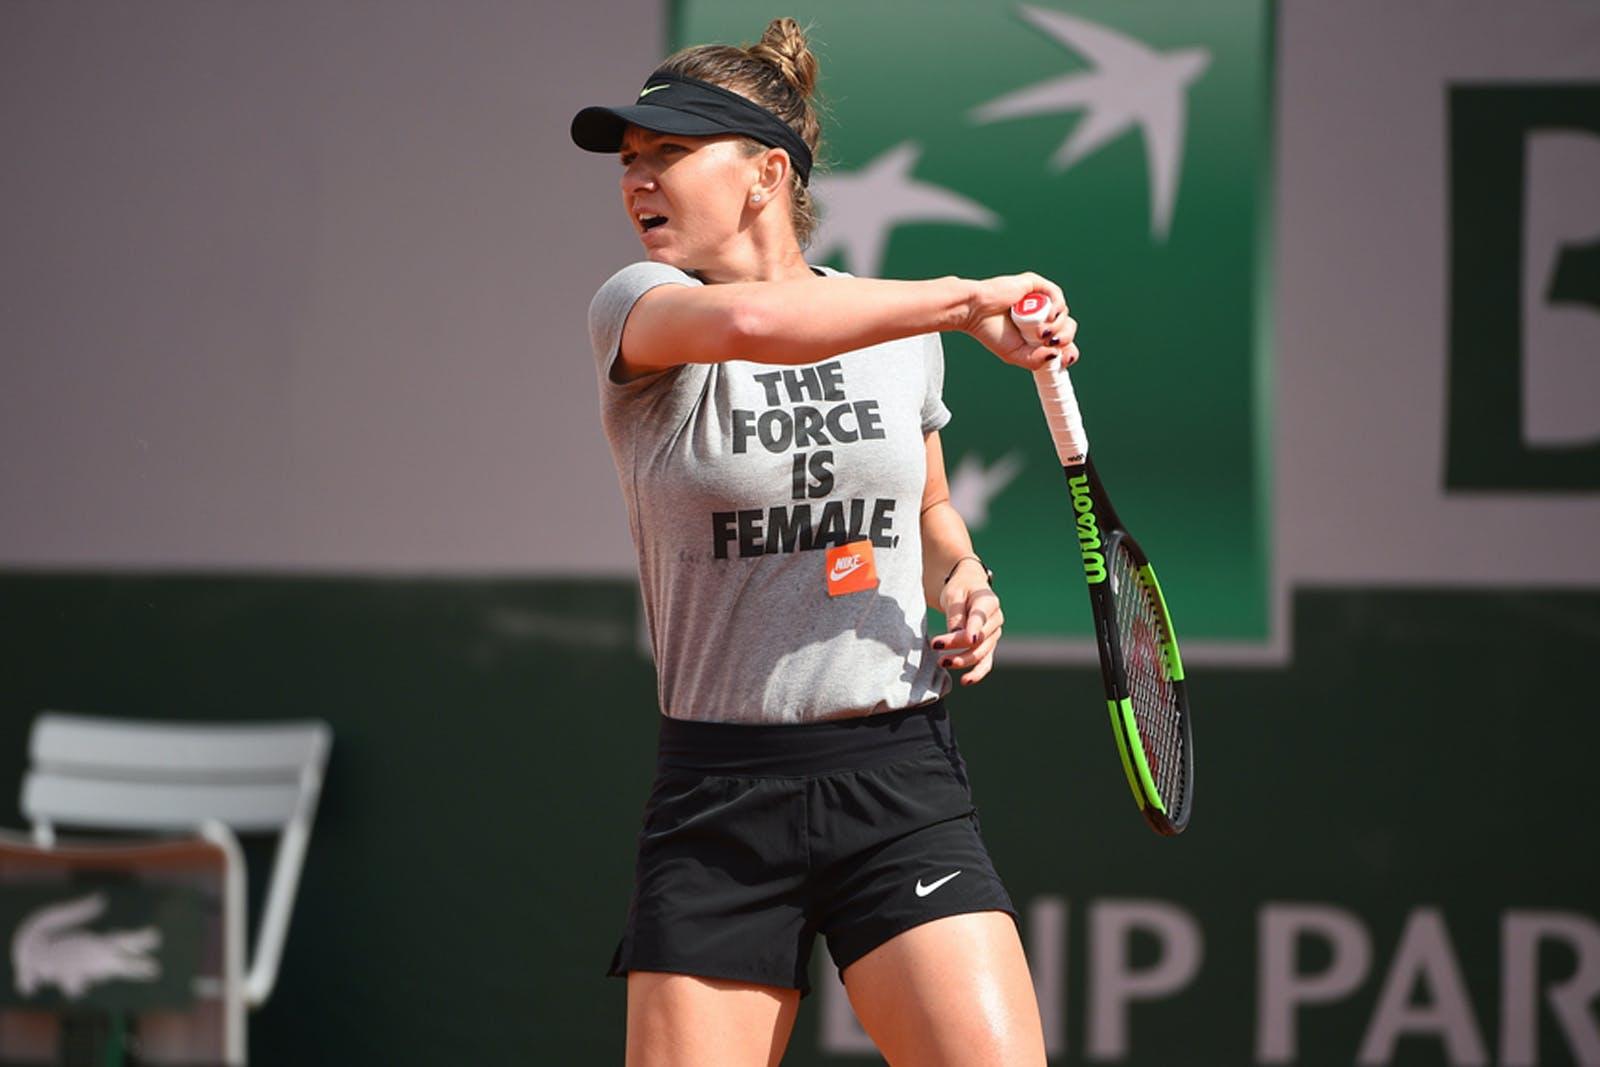 Simona Halep Roland Garros 2019 practice